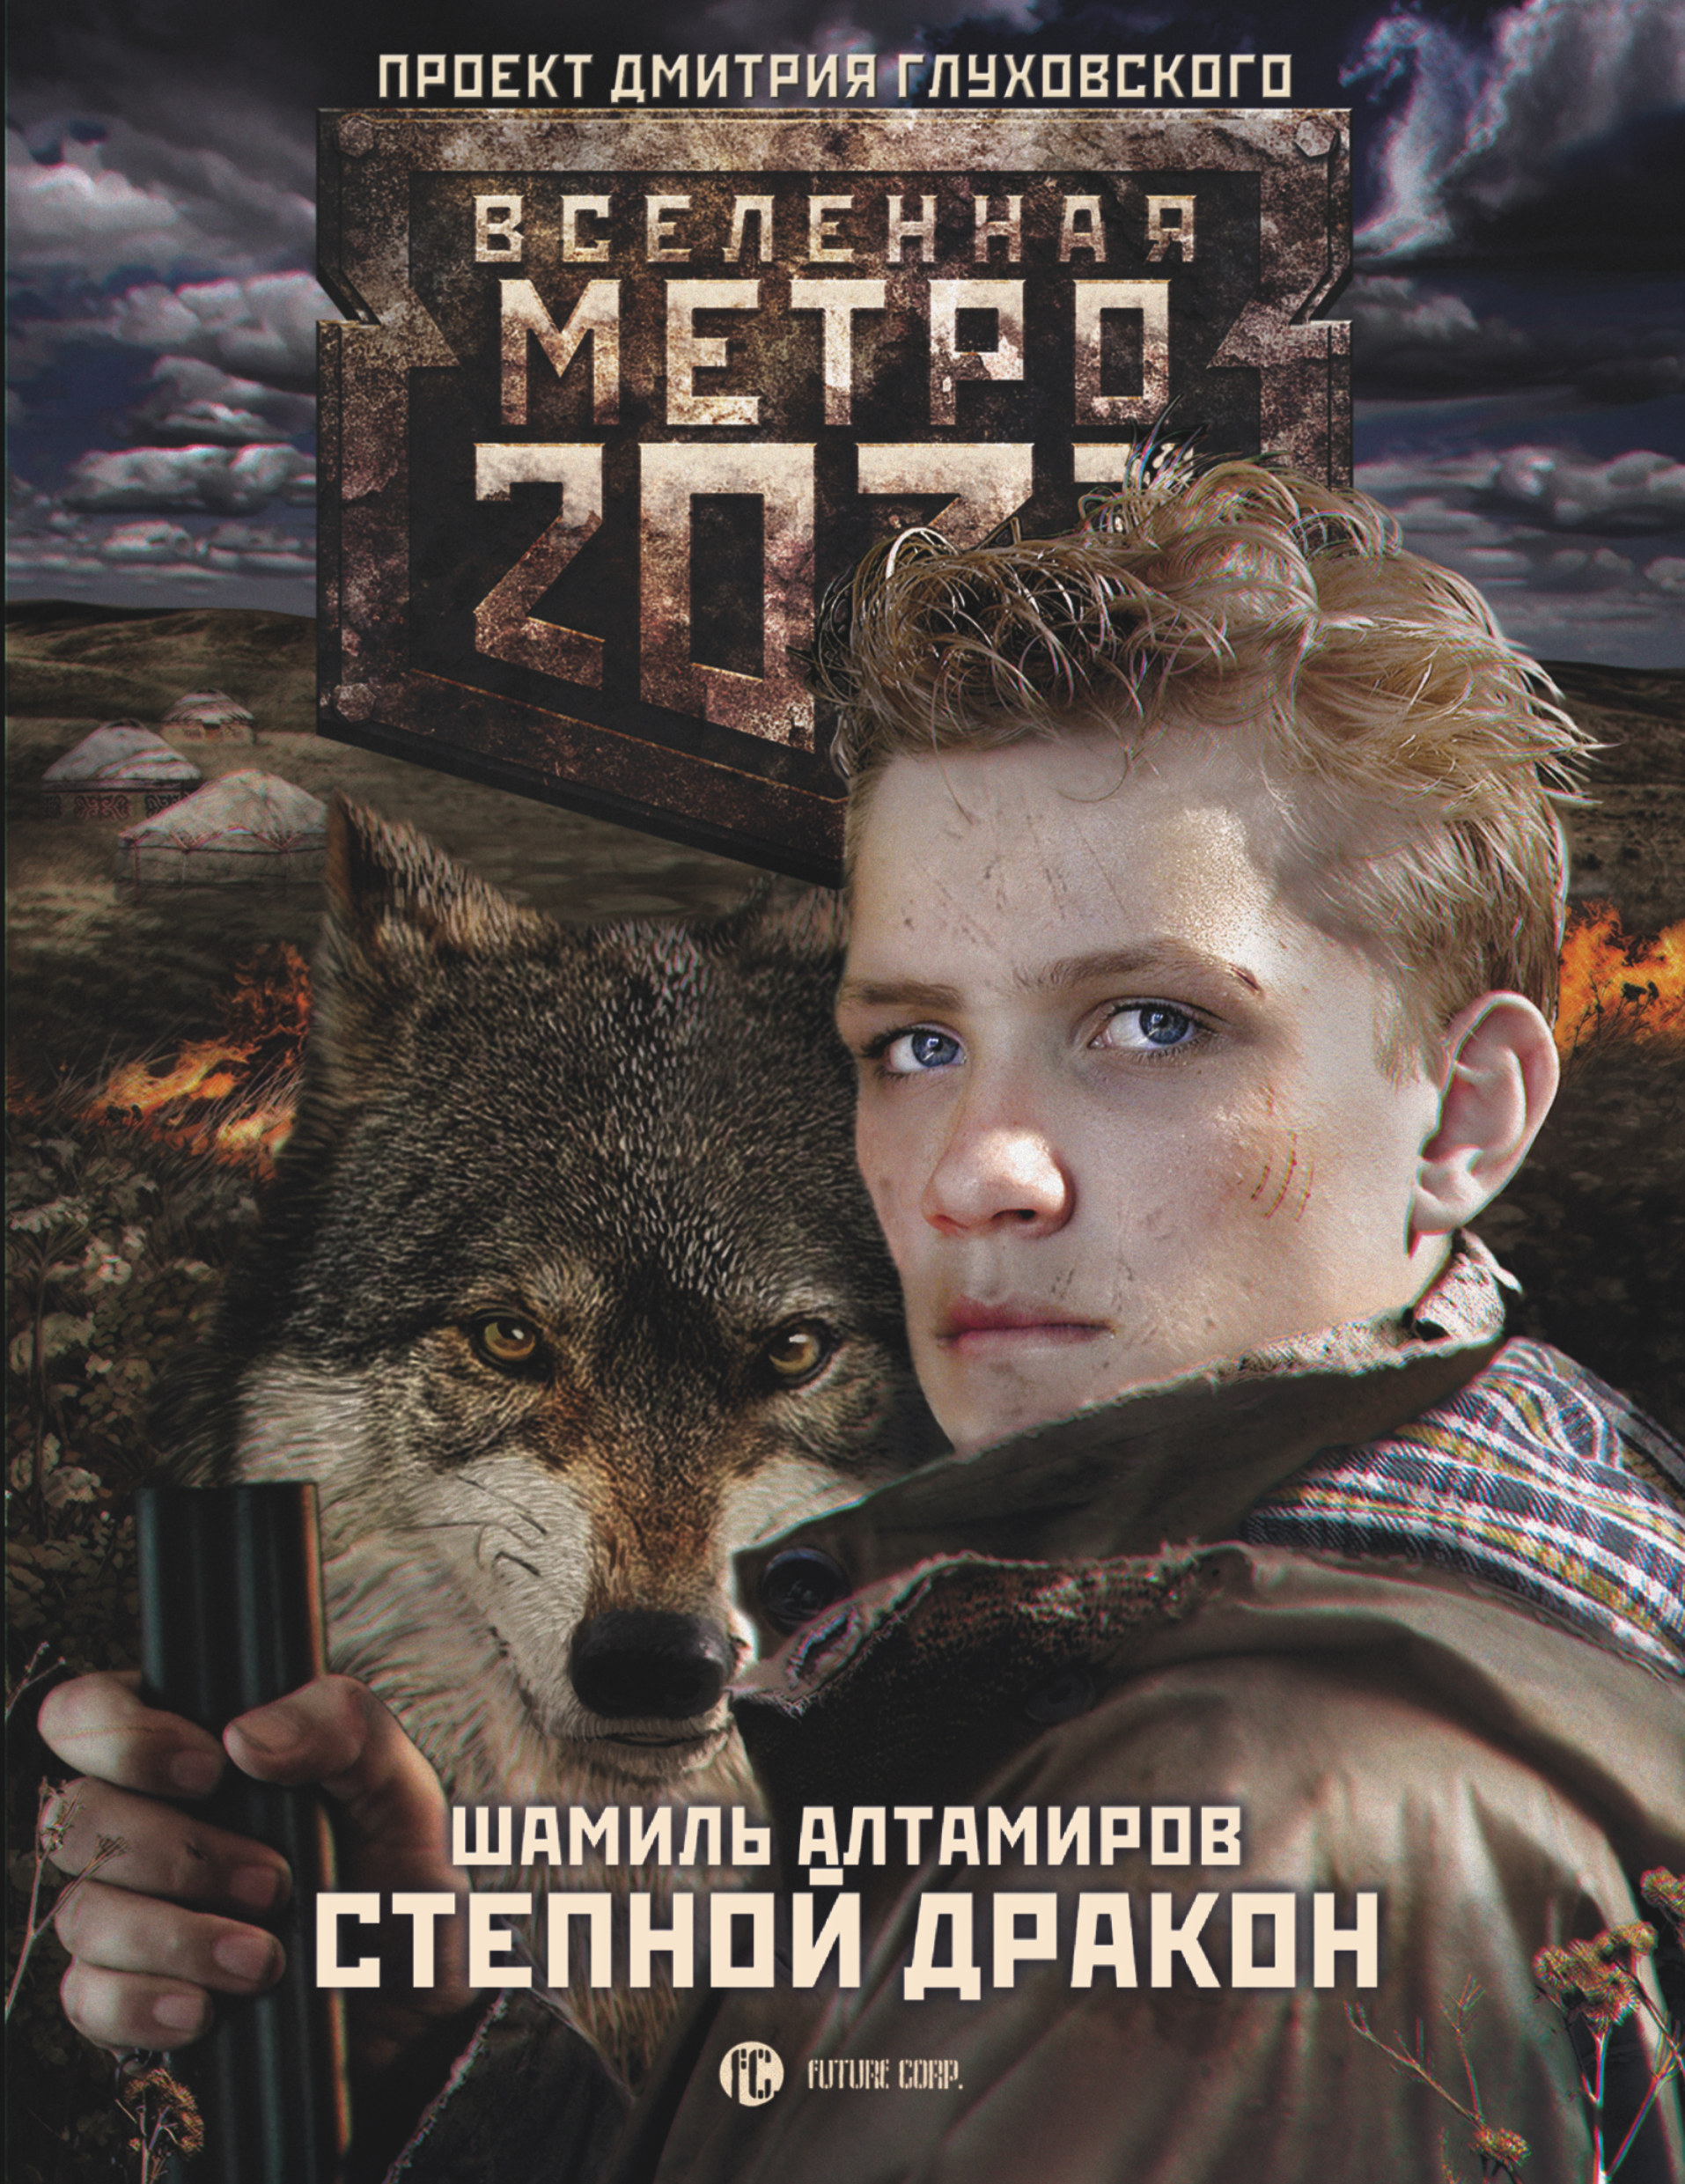 Алтамиров Ш.Р. Метро 2033: Степной дракон шабалов д метро 2033 право на жизнь